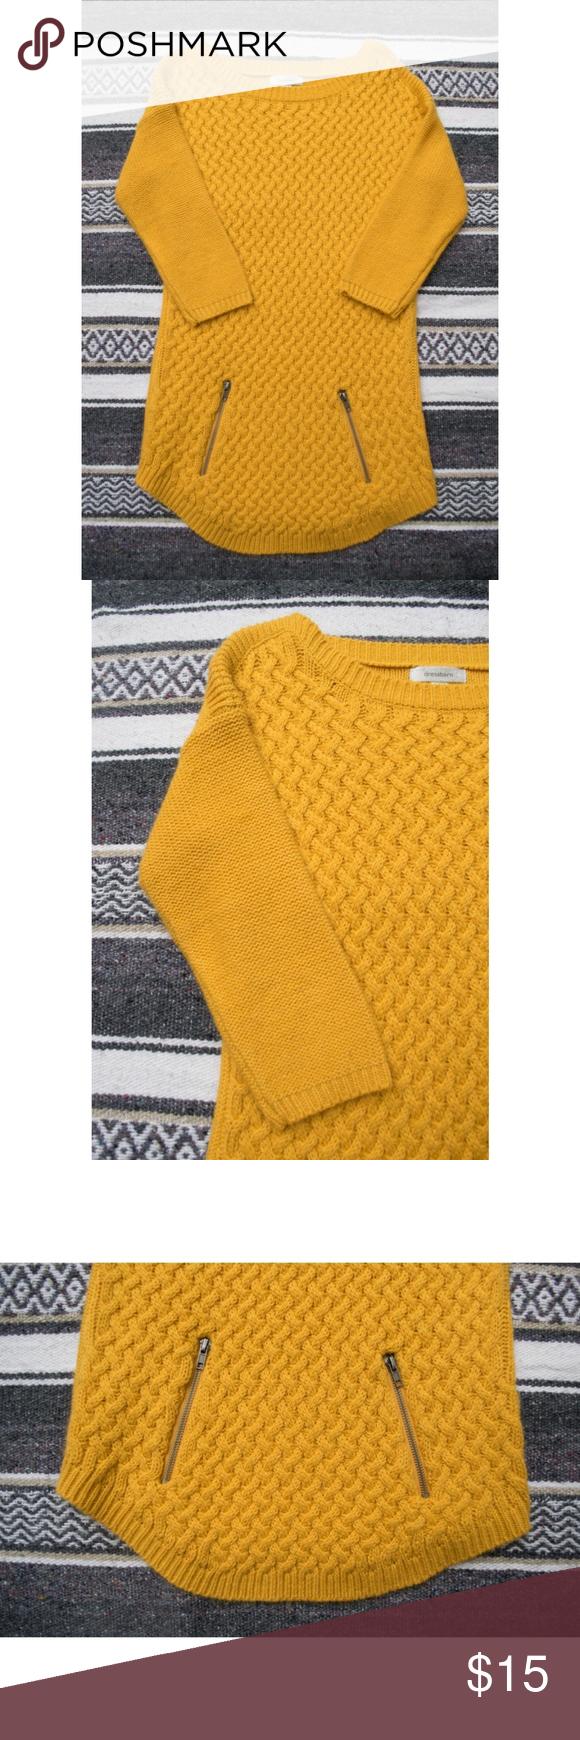 Dress Barn Yellow Gold Sweater Dress This yellow/gold Dress Barn ...